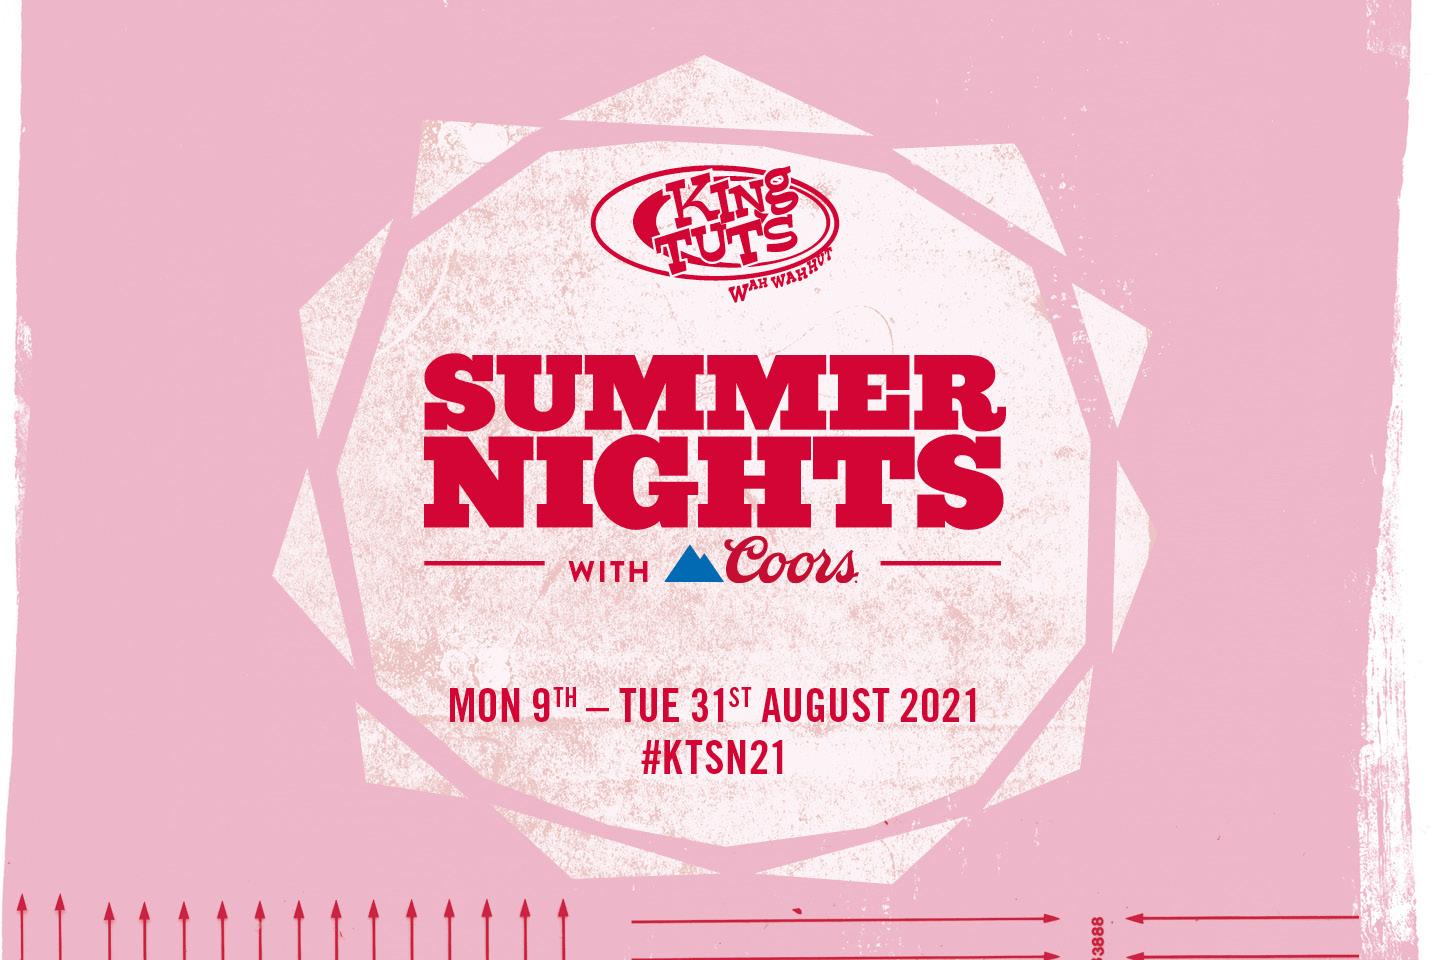 King Tut's Summer Nights